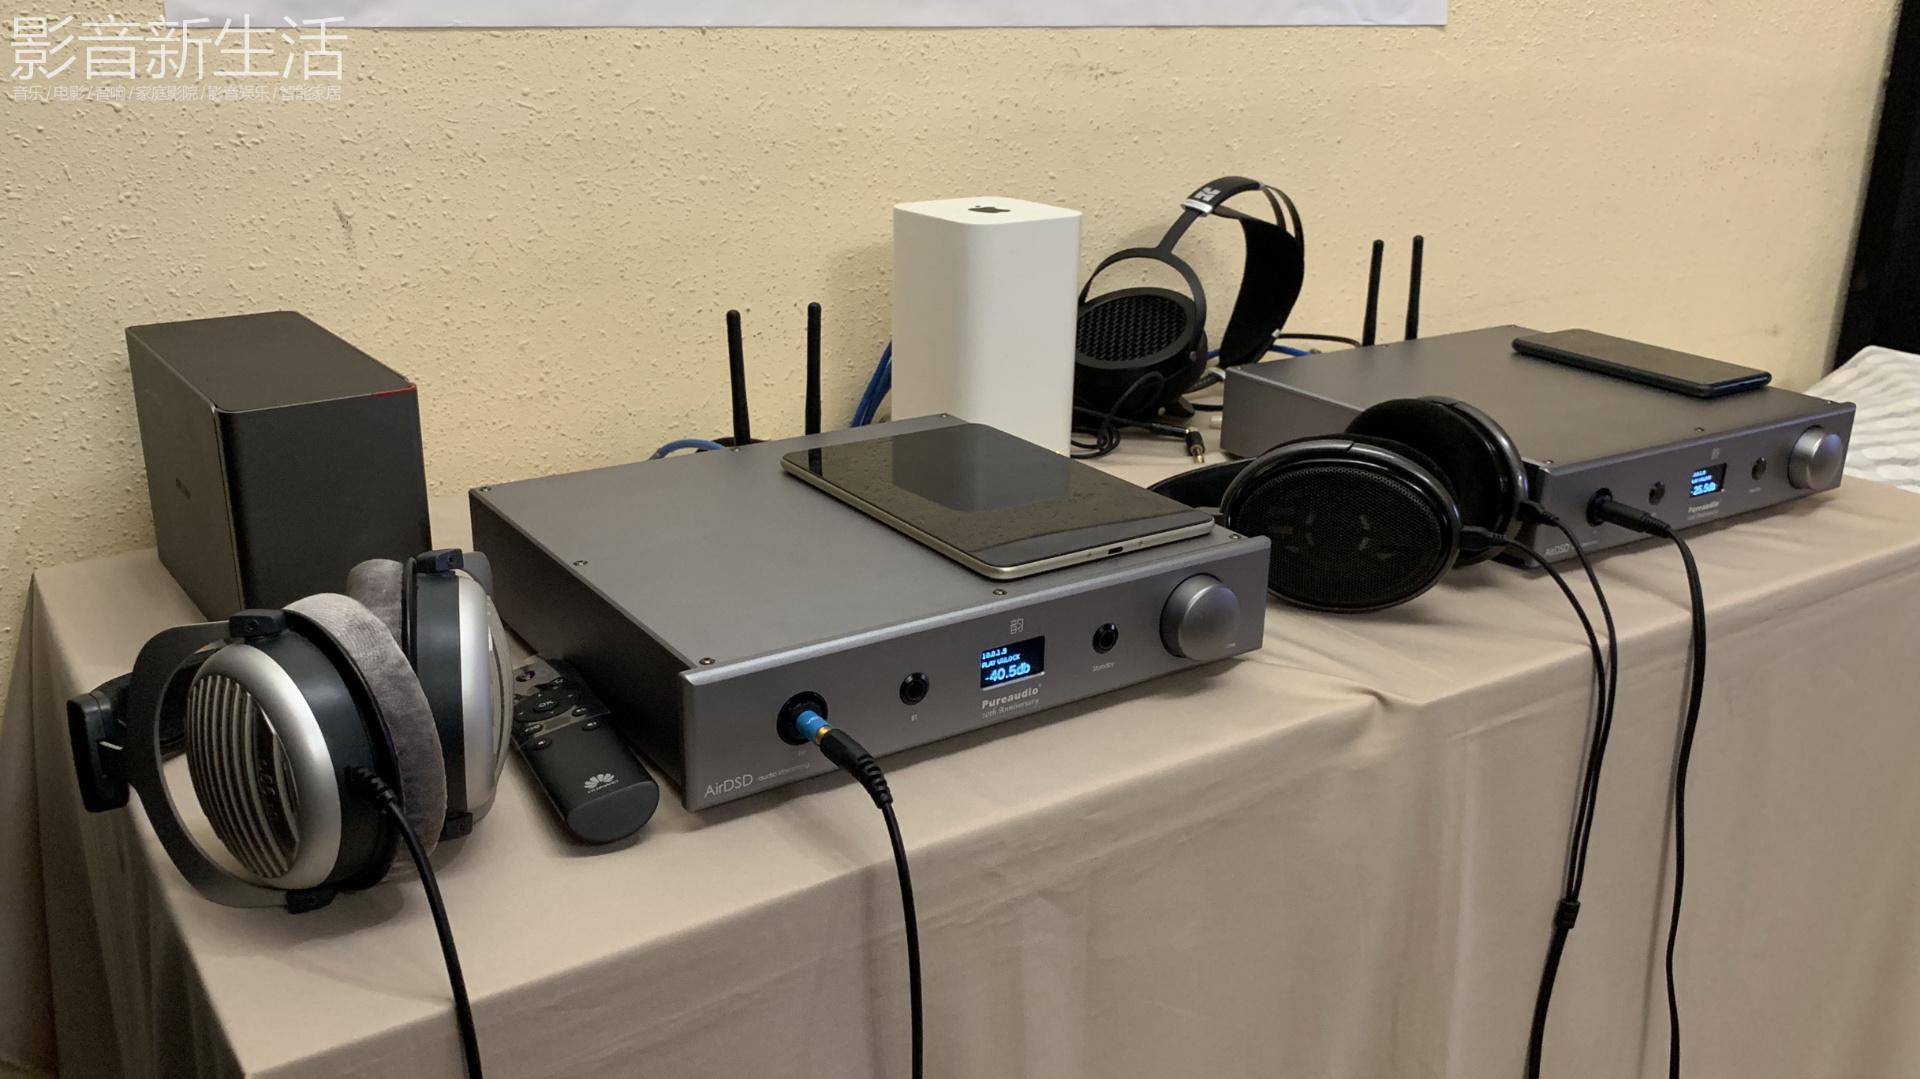 Pureaudio AirDSD HIFI 1 - 新品 | 2018柏韵10周年纪念产品:Pureaudio AirDSD音频流播放解码器发布!